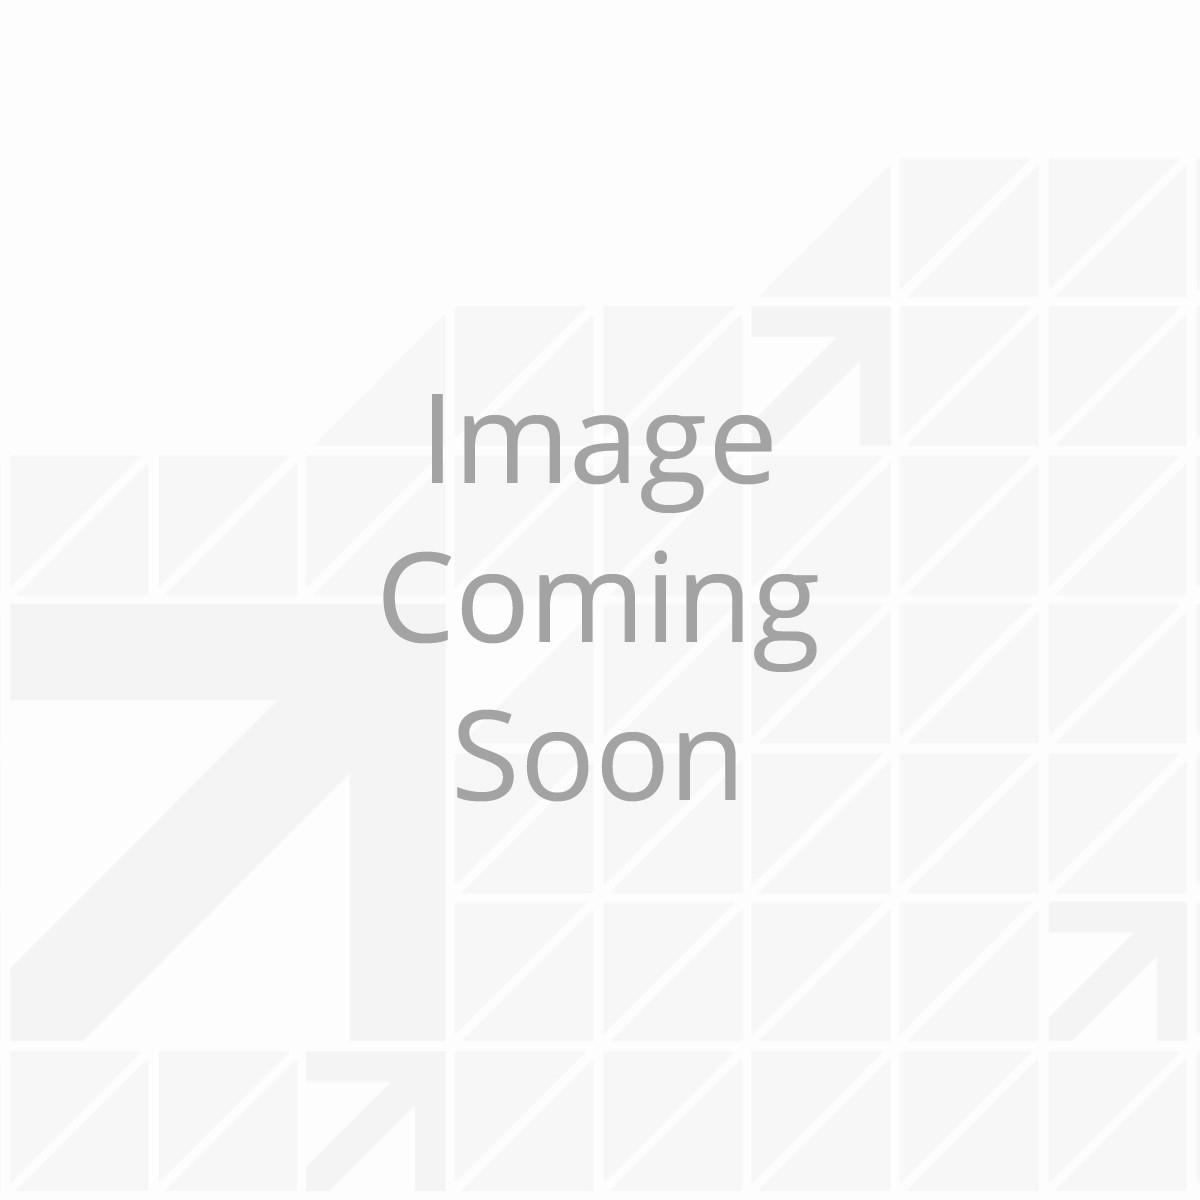 "ALPHABOND TPO Tape 3"" x 50' - Various Colors"